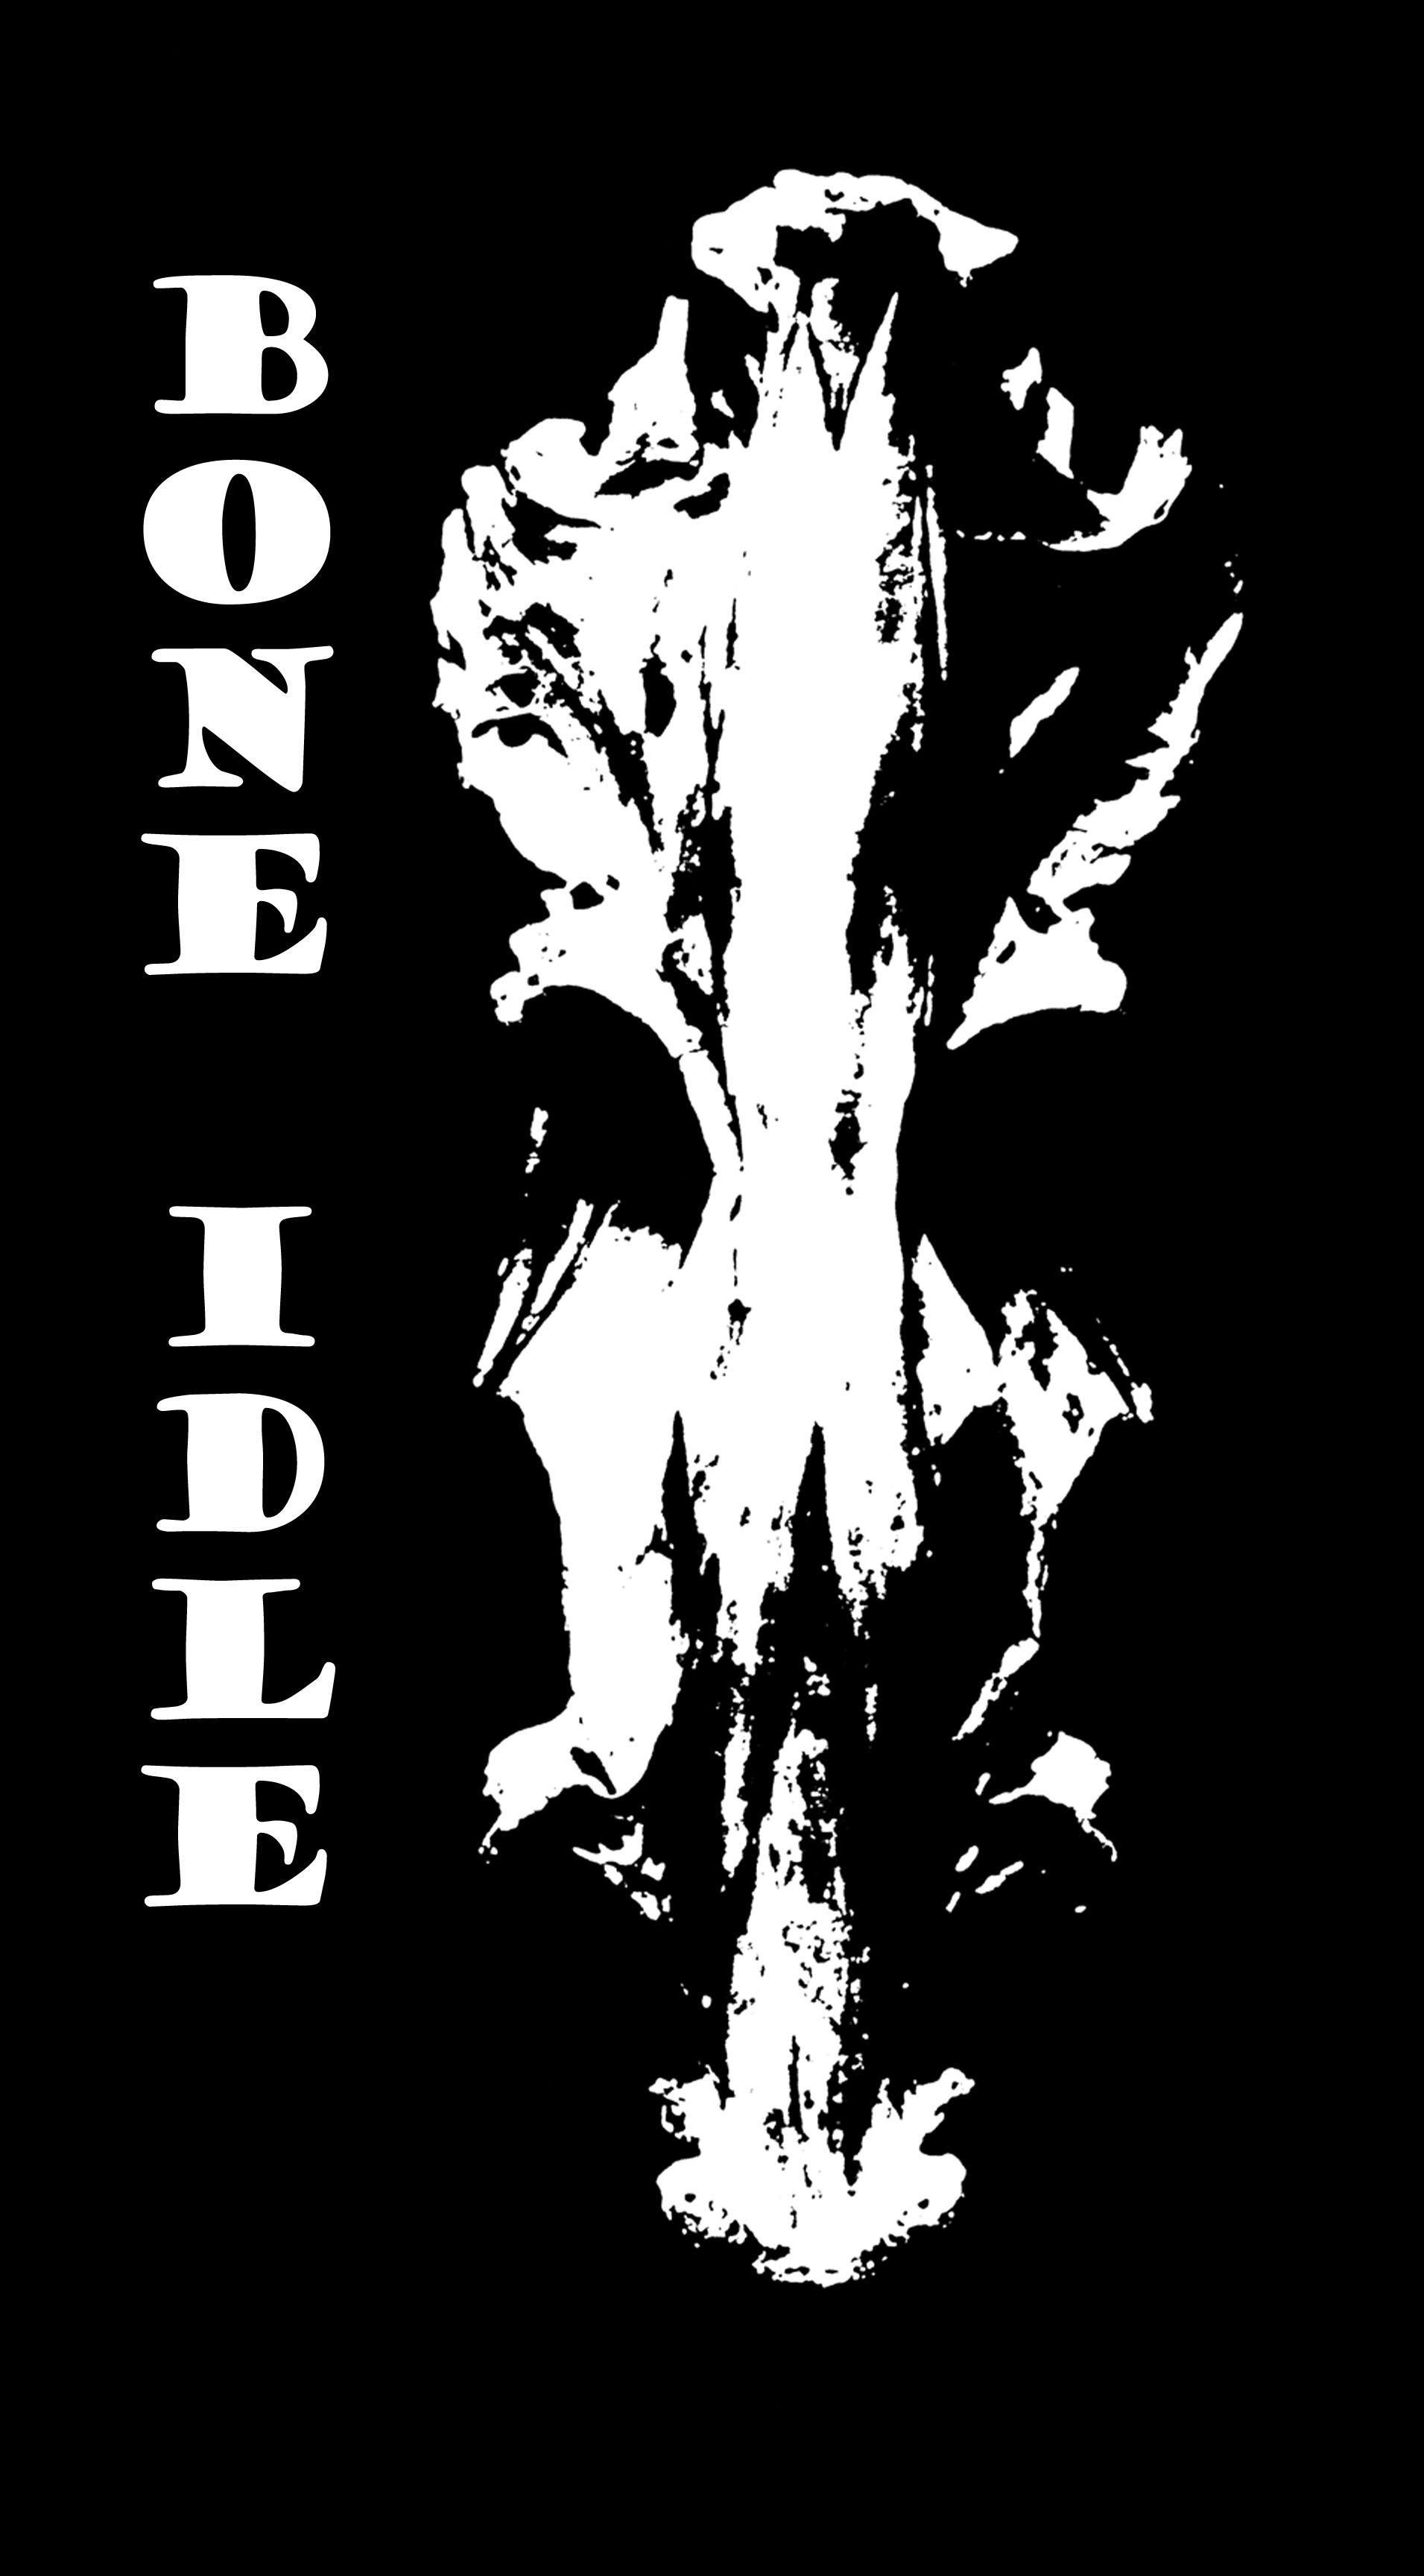 Bone Idol copy.psd for business card